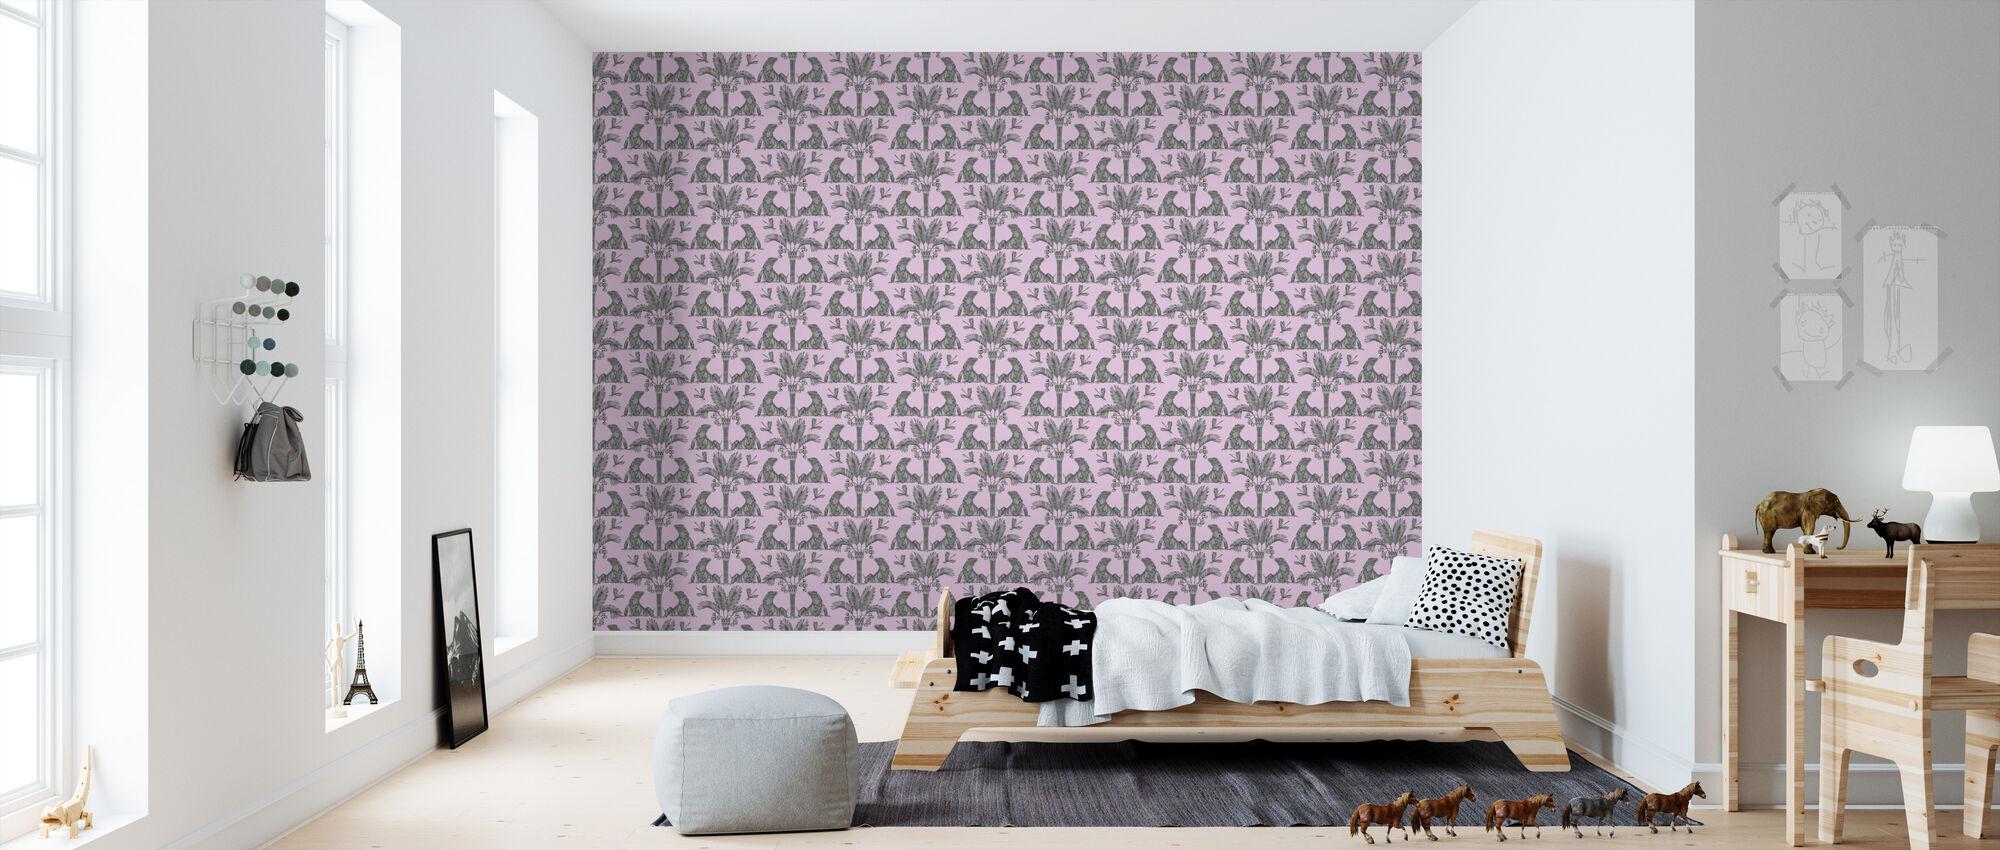 The Iguana Dream - Bubbelgum and Steel - Wallpaper - Kids Room